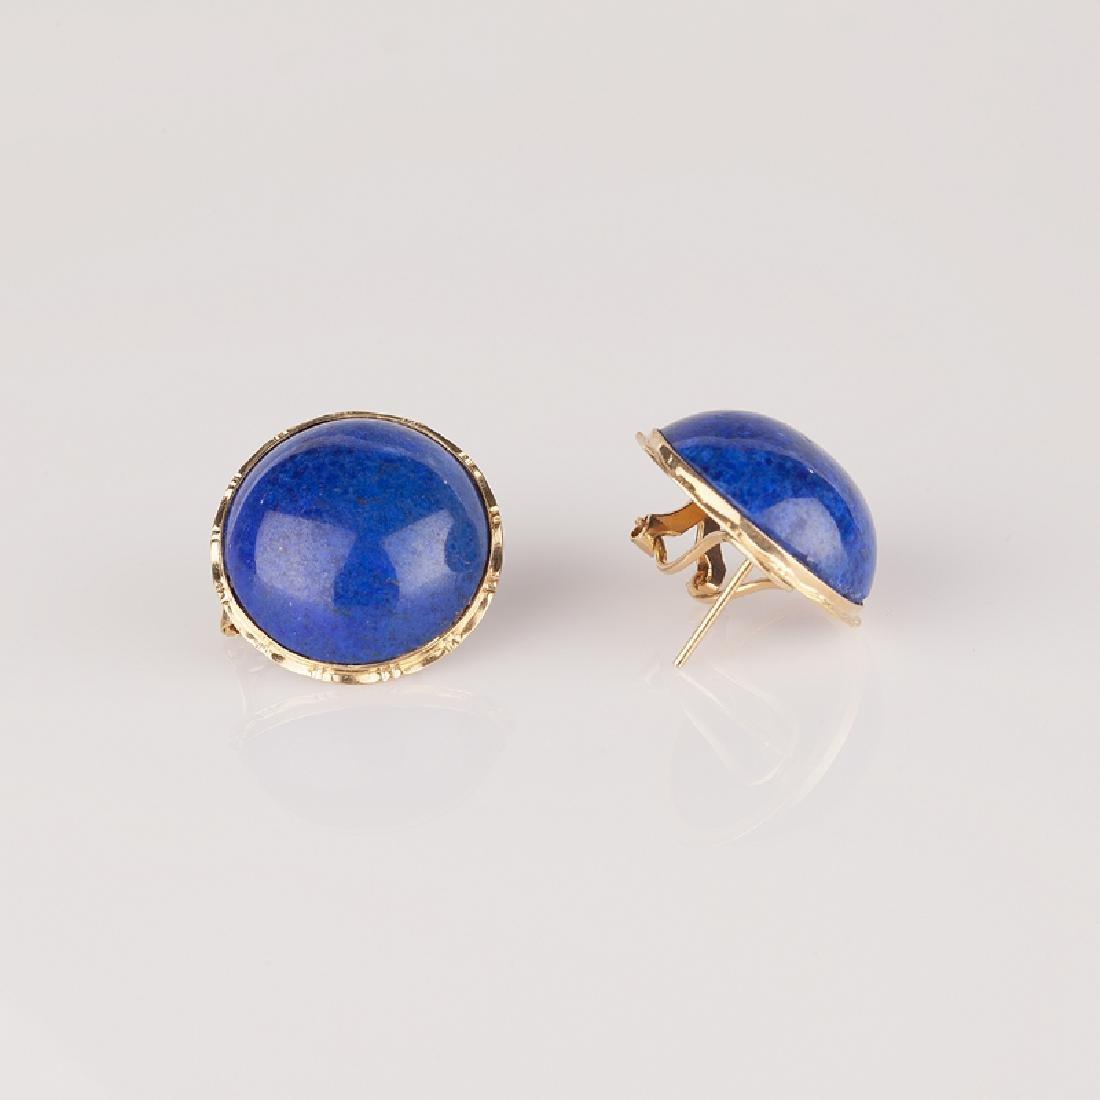 *Fine Jewelry 14 kt. Gold, New Custom Made, Lapis, One